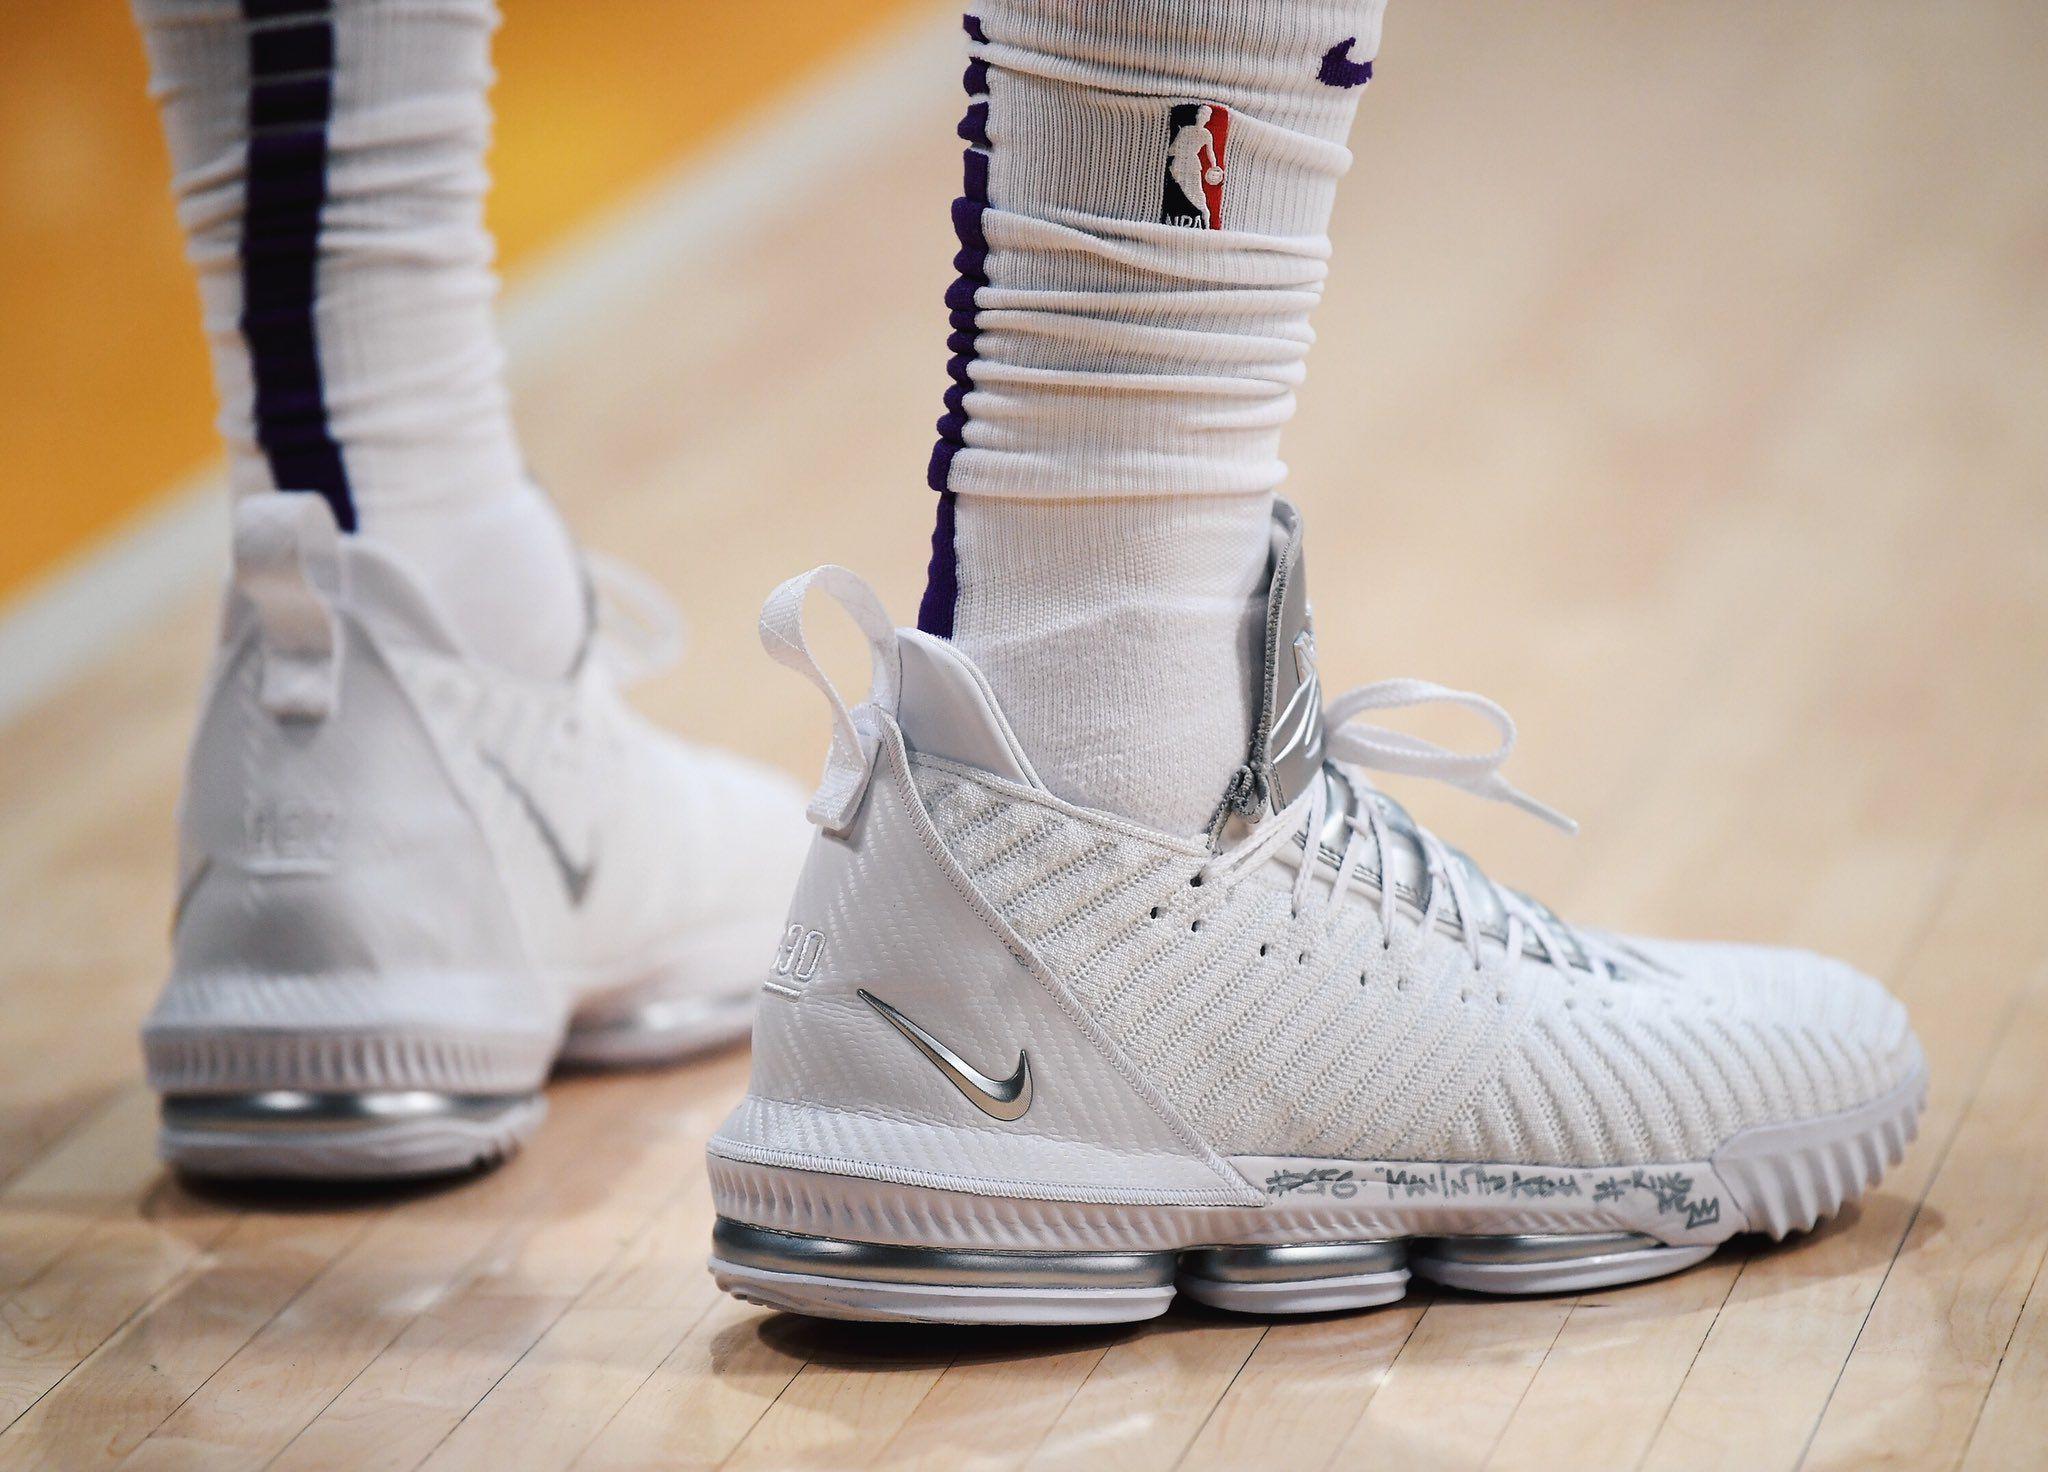 afbb7bcf11f 2018.11.30. LAL LeBron James Nike LeBron 16 PE